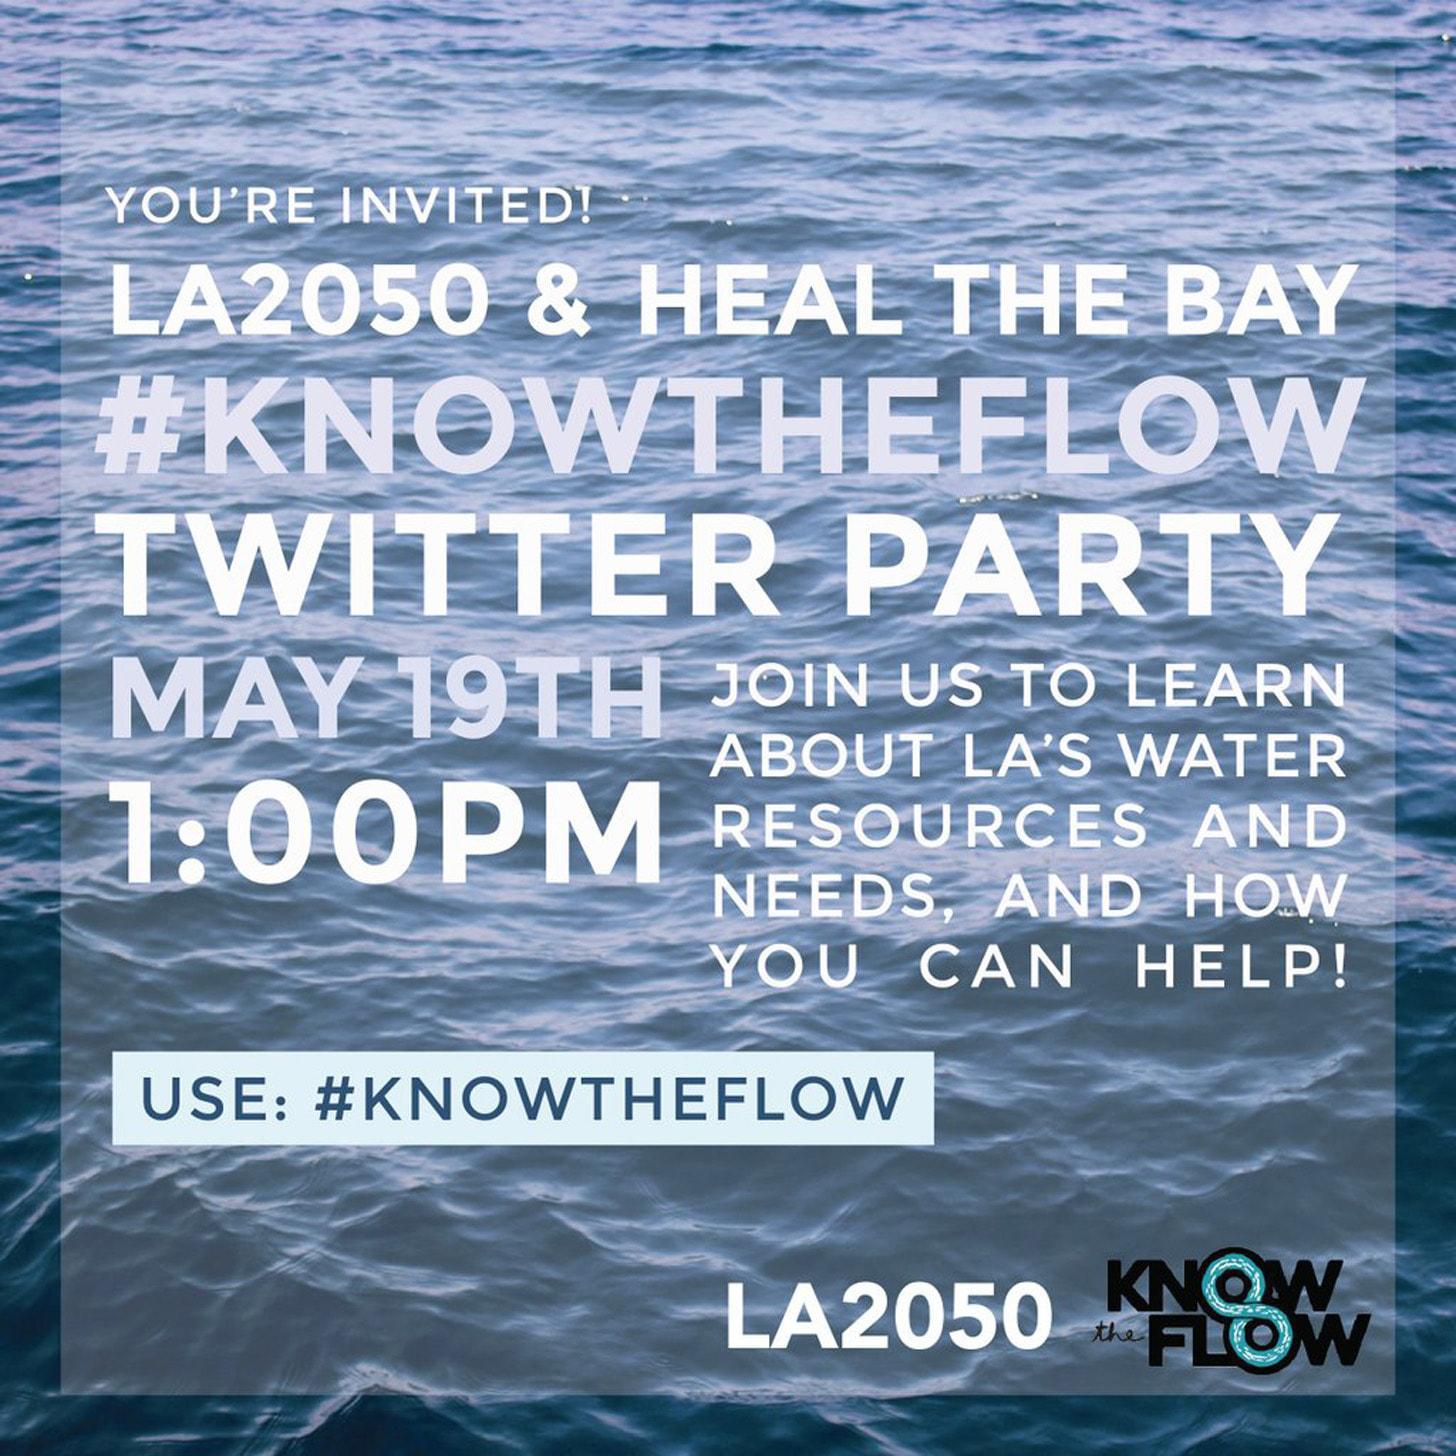 LA2050 Twitter post